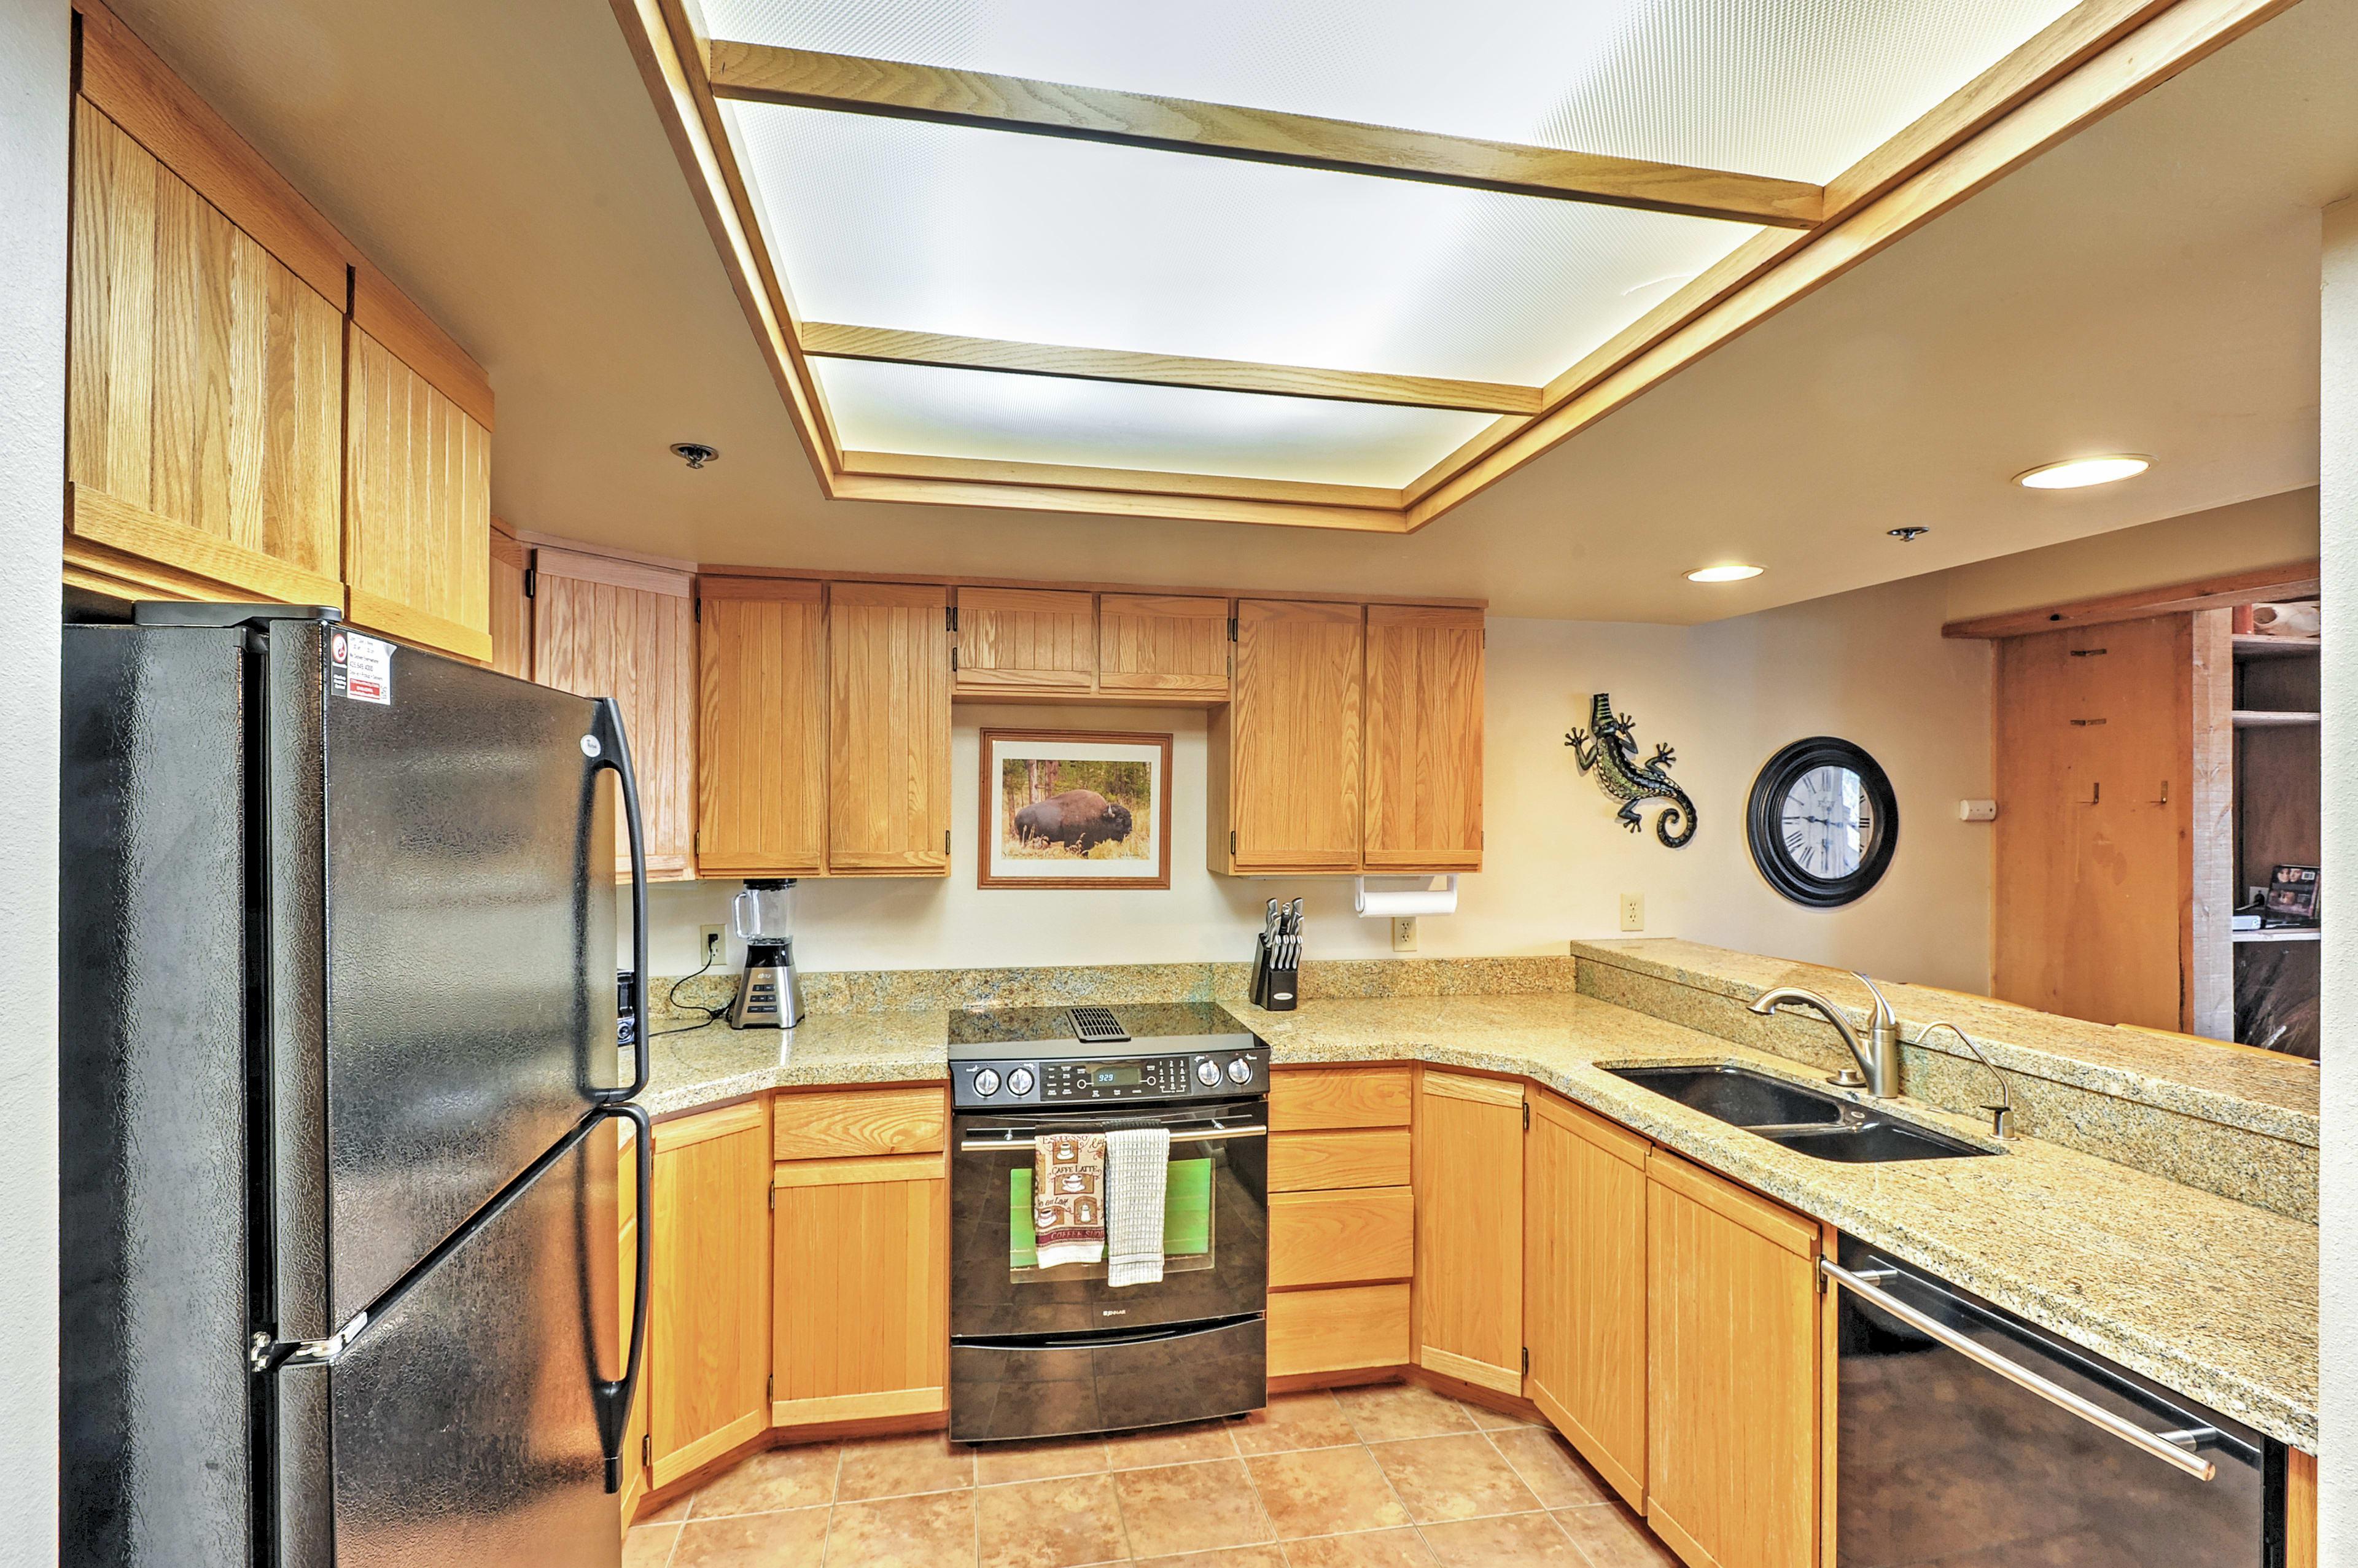 Kitchen | Dishwasher